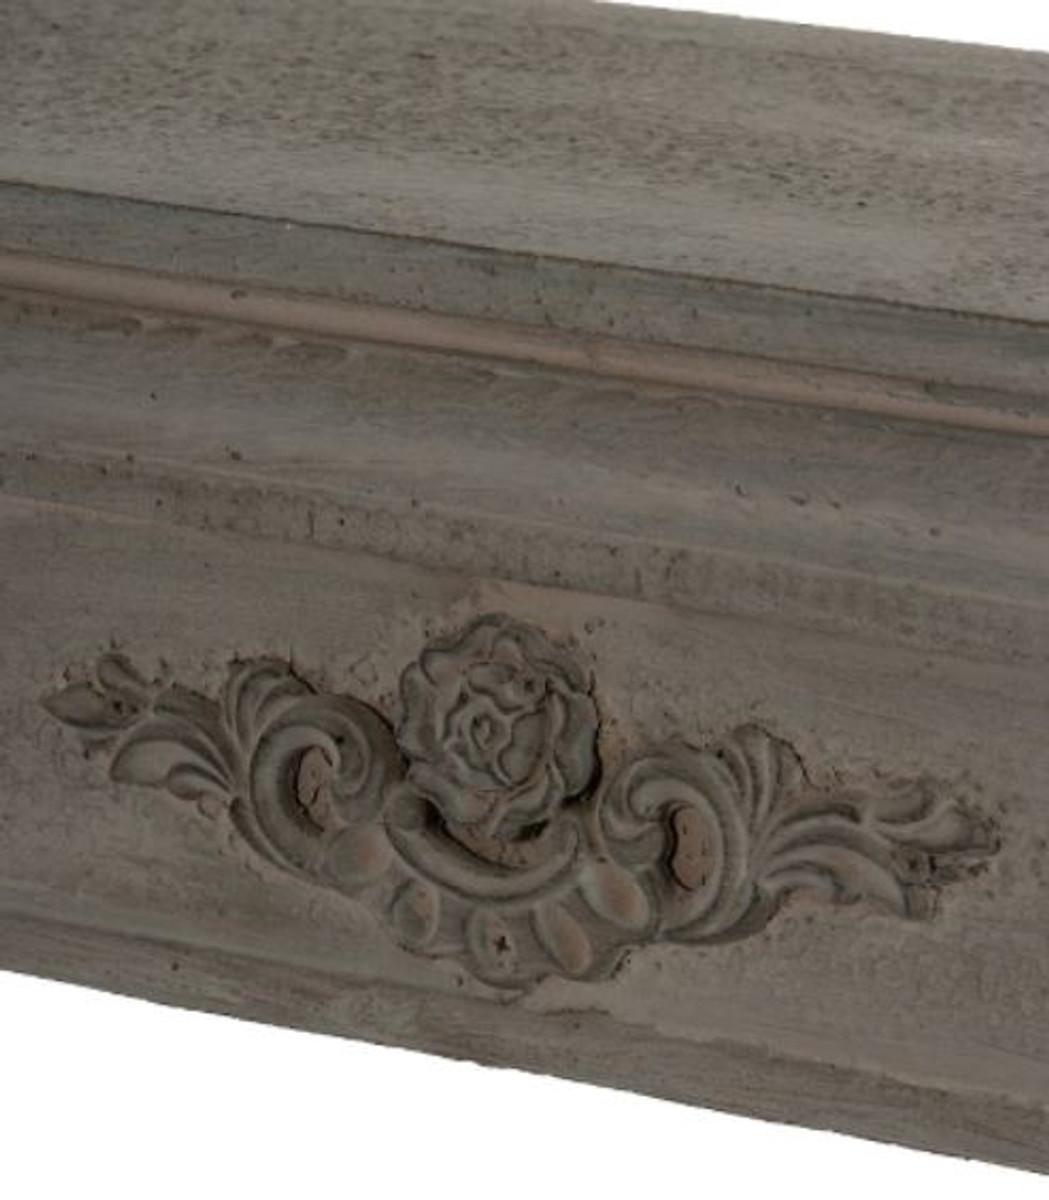 Casa Padrino Landhausstil Kaminumrandung Antik Graubraun 113 x 19 x H. 101 cm - Handgefertigte Shabby Chic Möbel 3